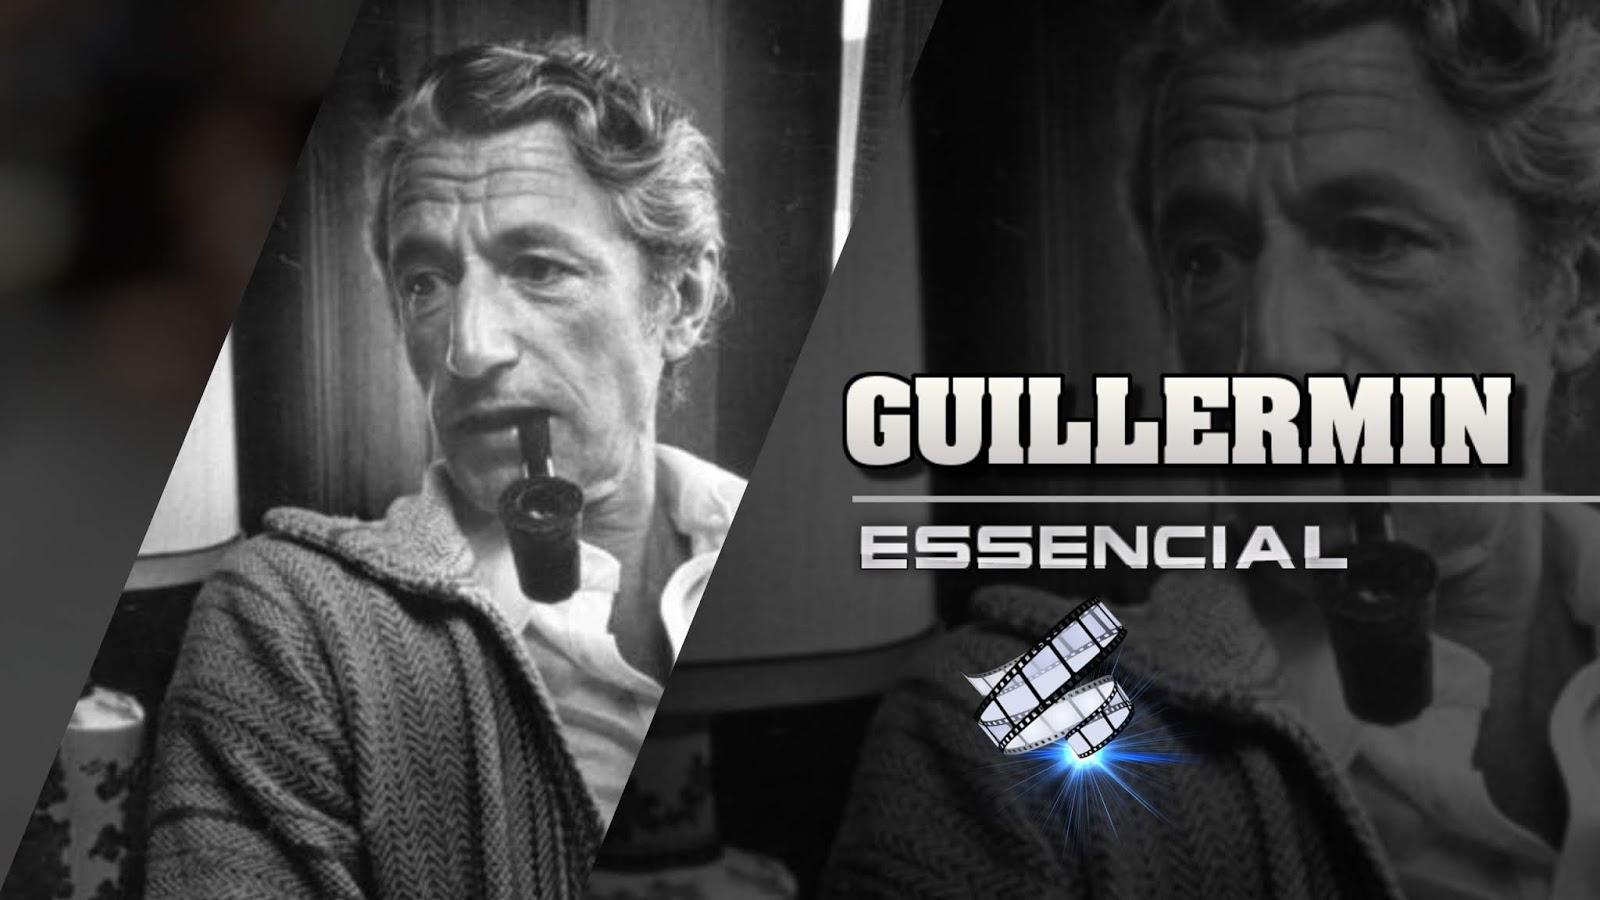 john-guillermin-10-filmes-essenciais